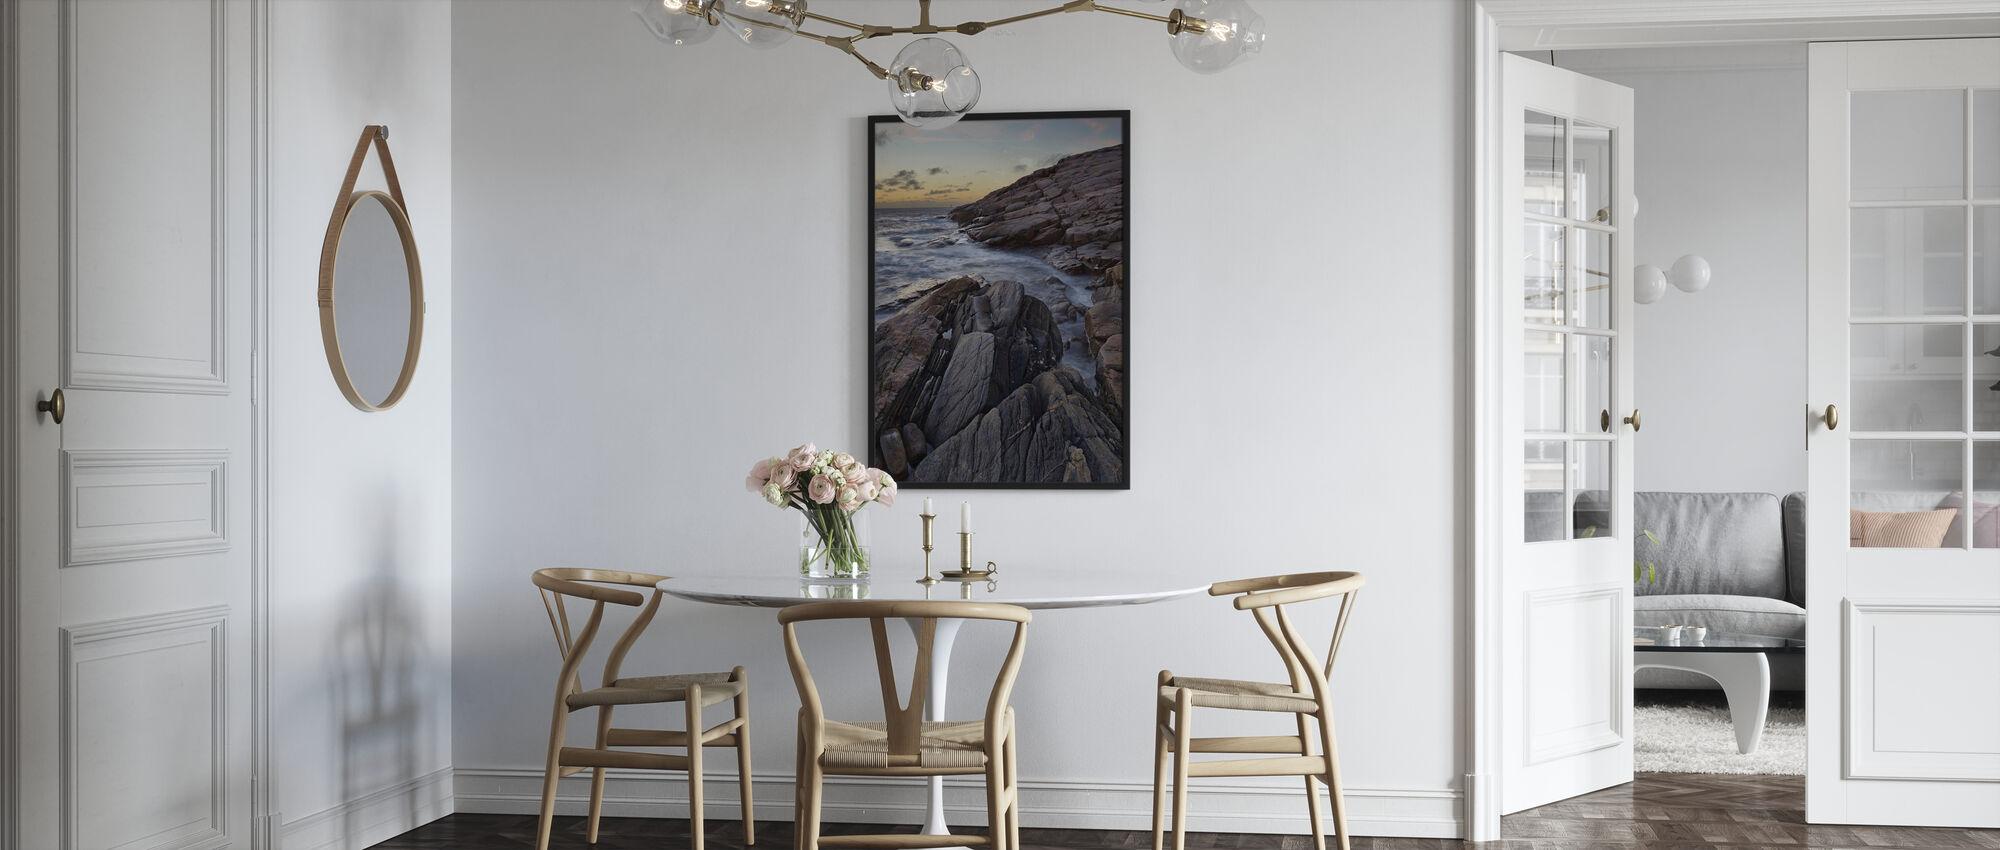 Klippor i Grebbestad, Sverige - Inramad tavla - Kök